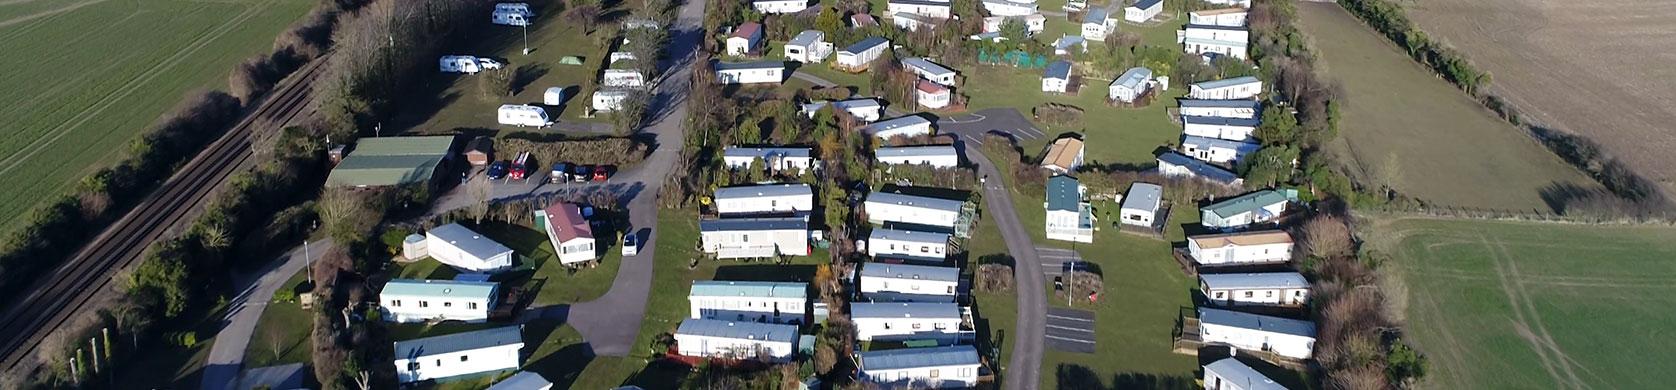 Our Communities | Hometown Communities Management Group